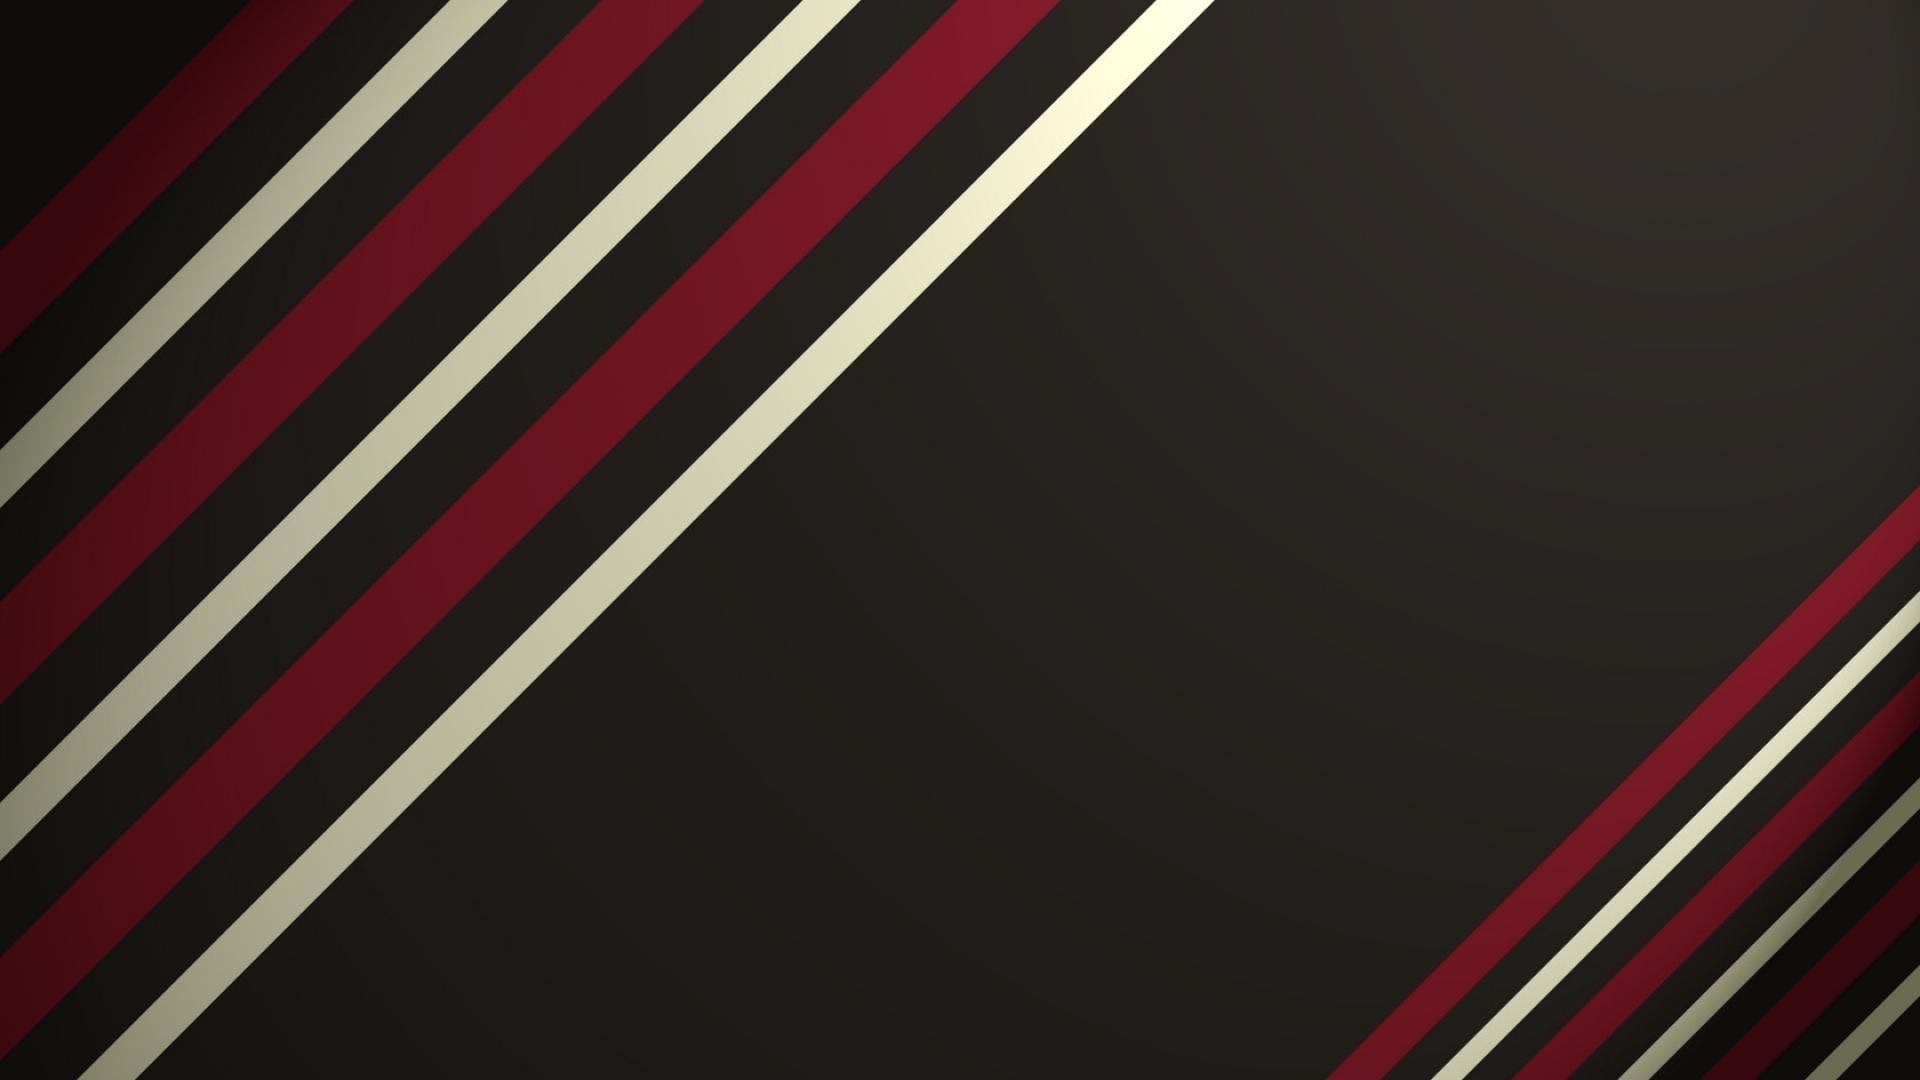 Minimalistic Stripes Wallpaper Theme